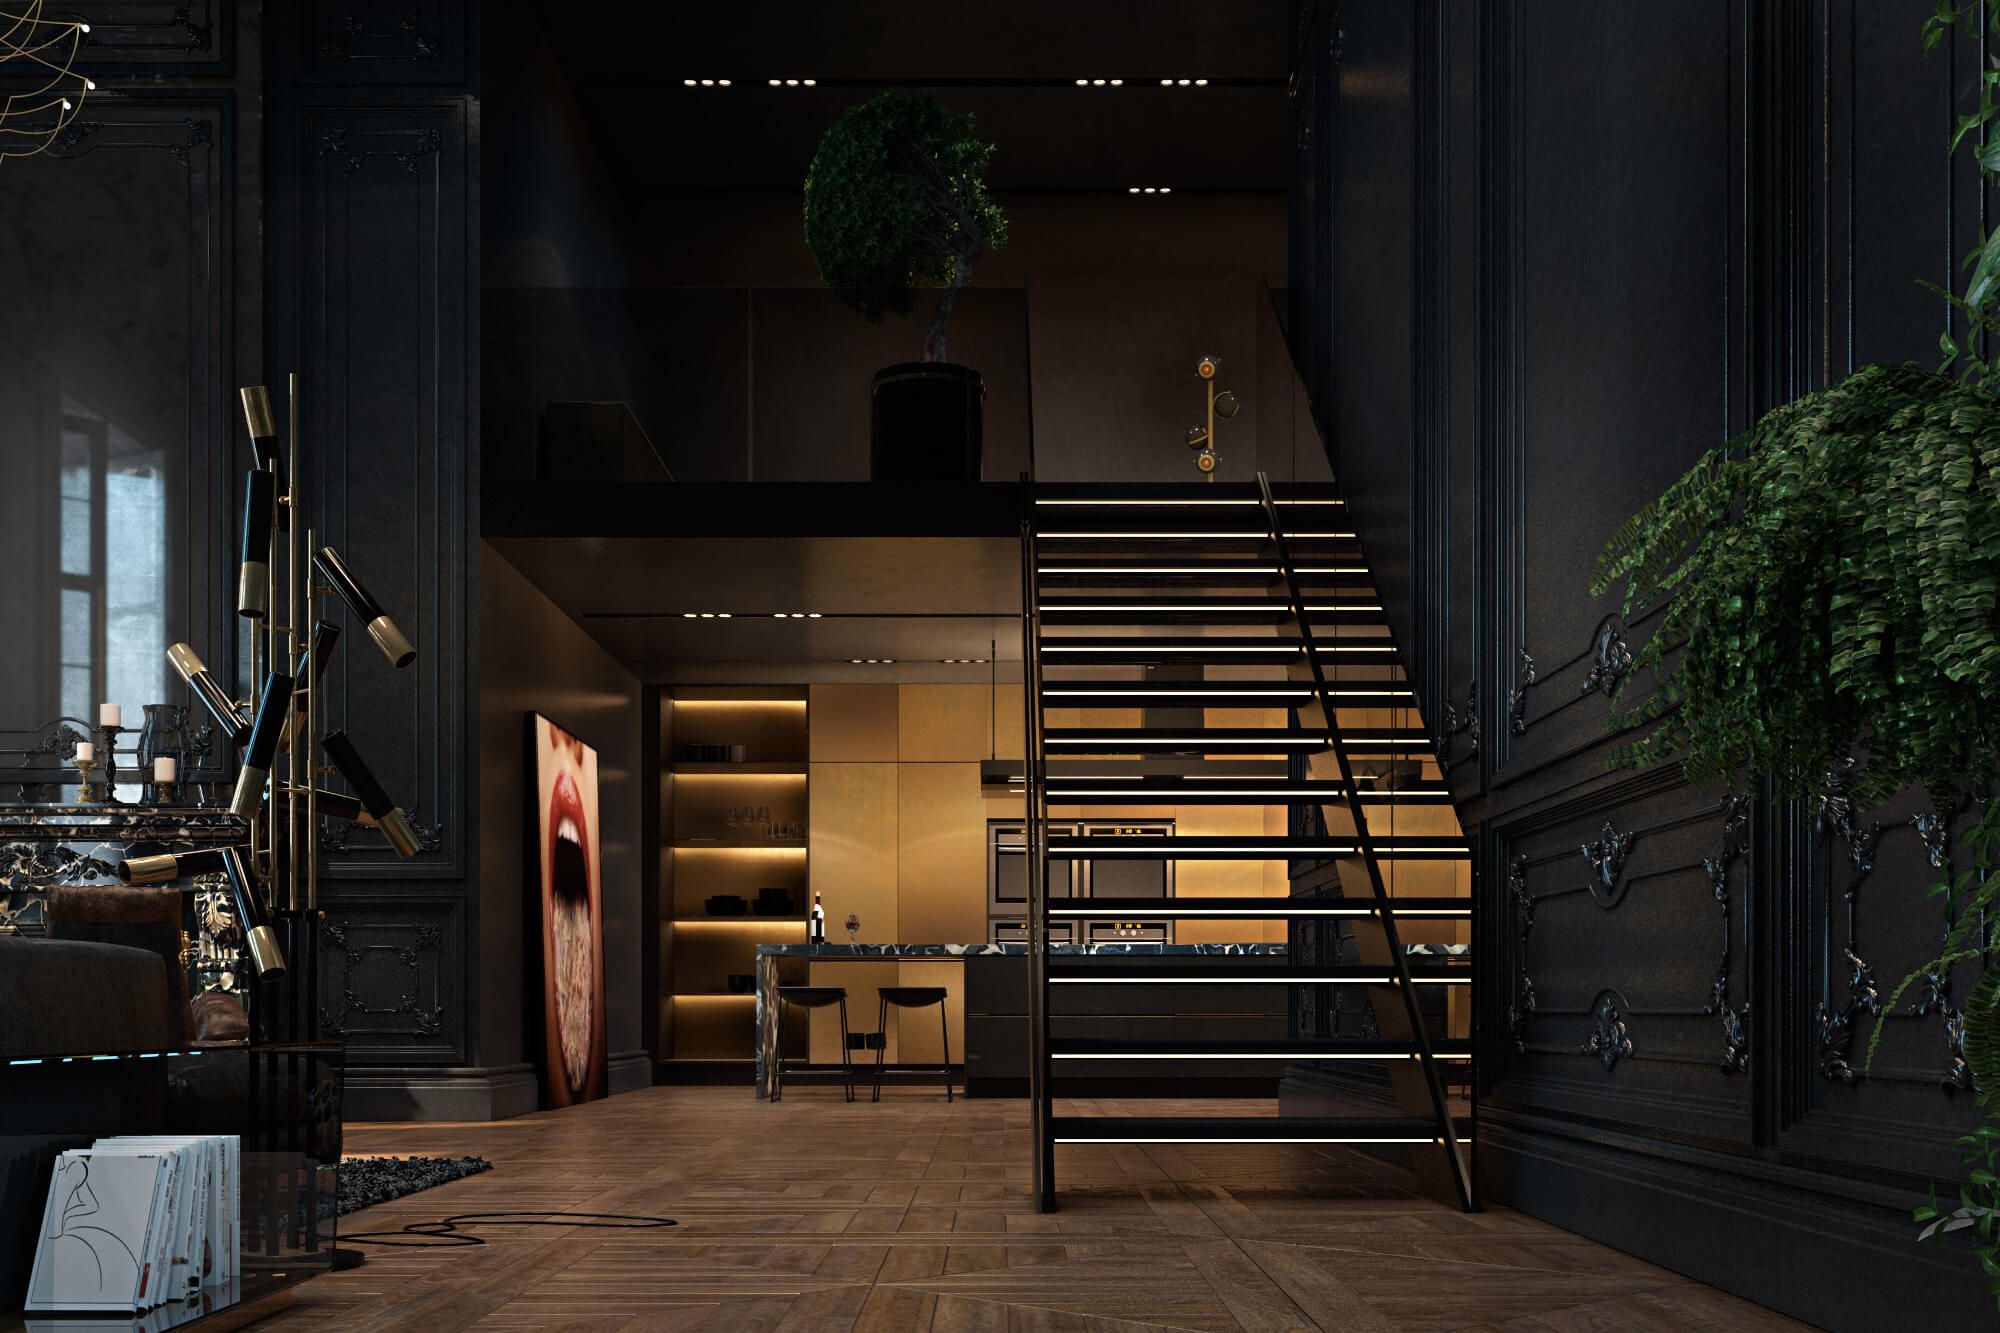 apartment-paris-iryna-dzhemesiuk-vitaliy-yurov-03